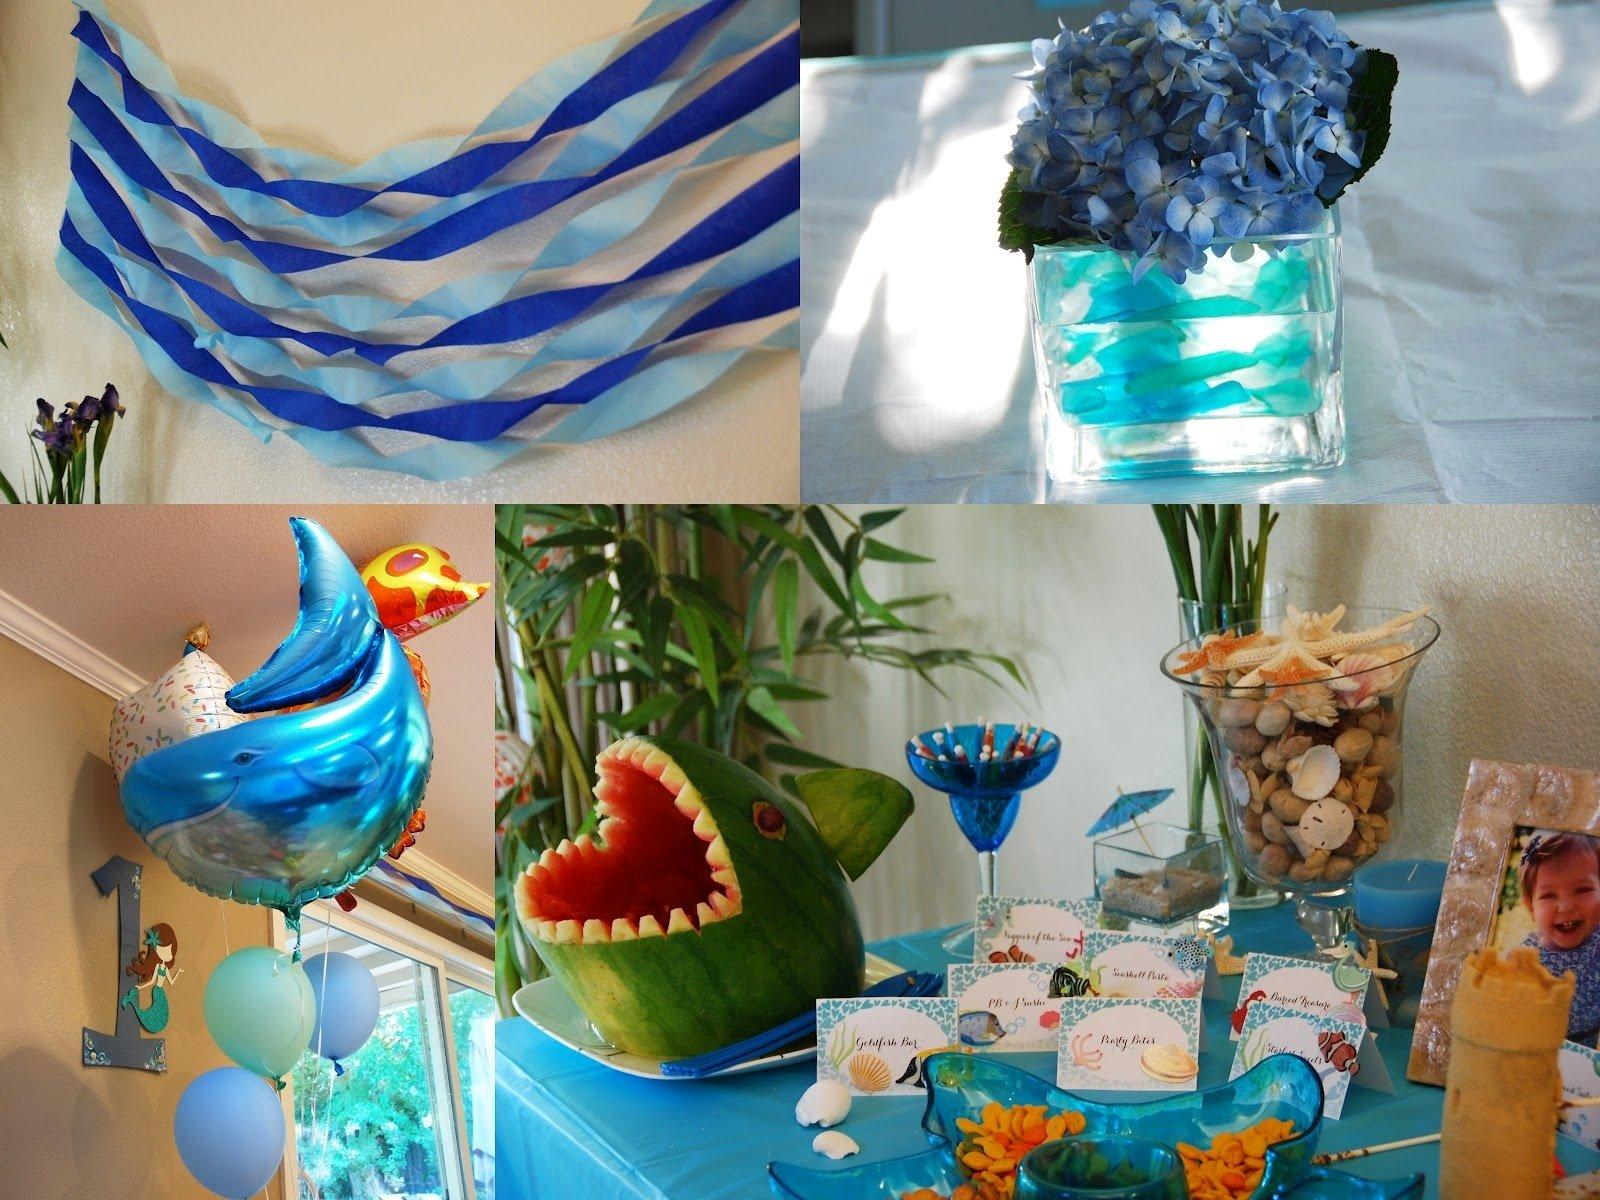 10 Fabulous Under The Sea Party Decoration Ideas under the sea 1st birthday party decorations from under the sea 1 2021